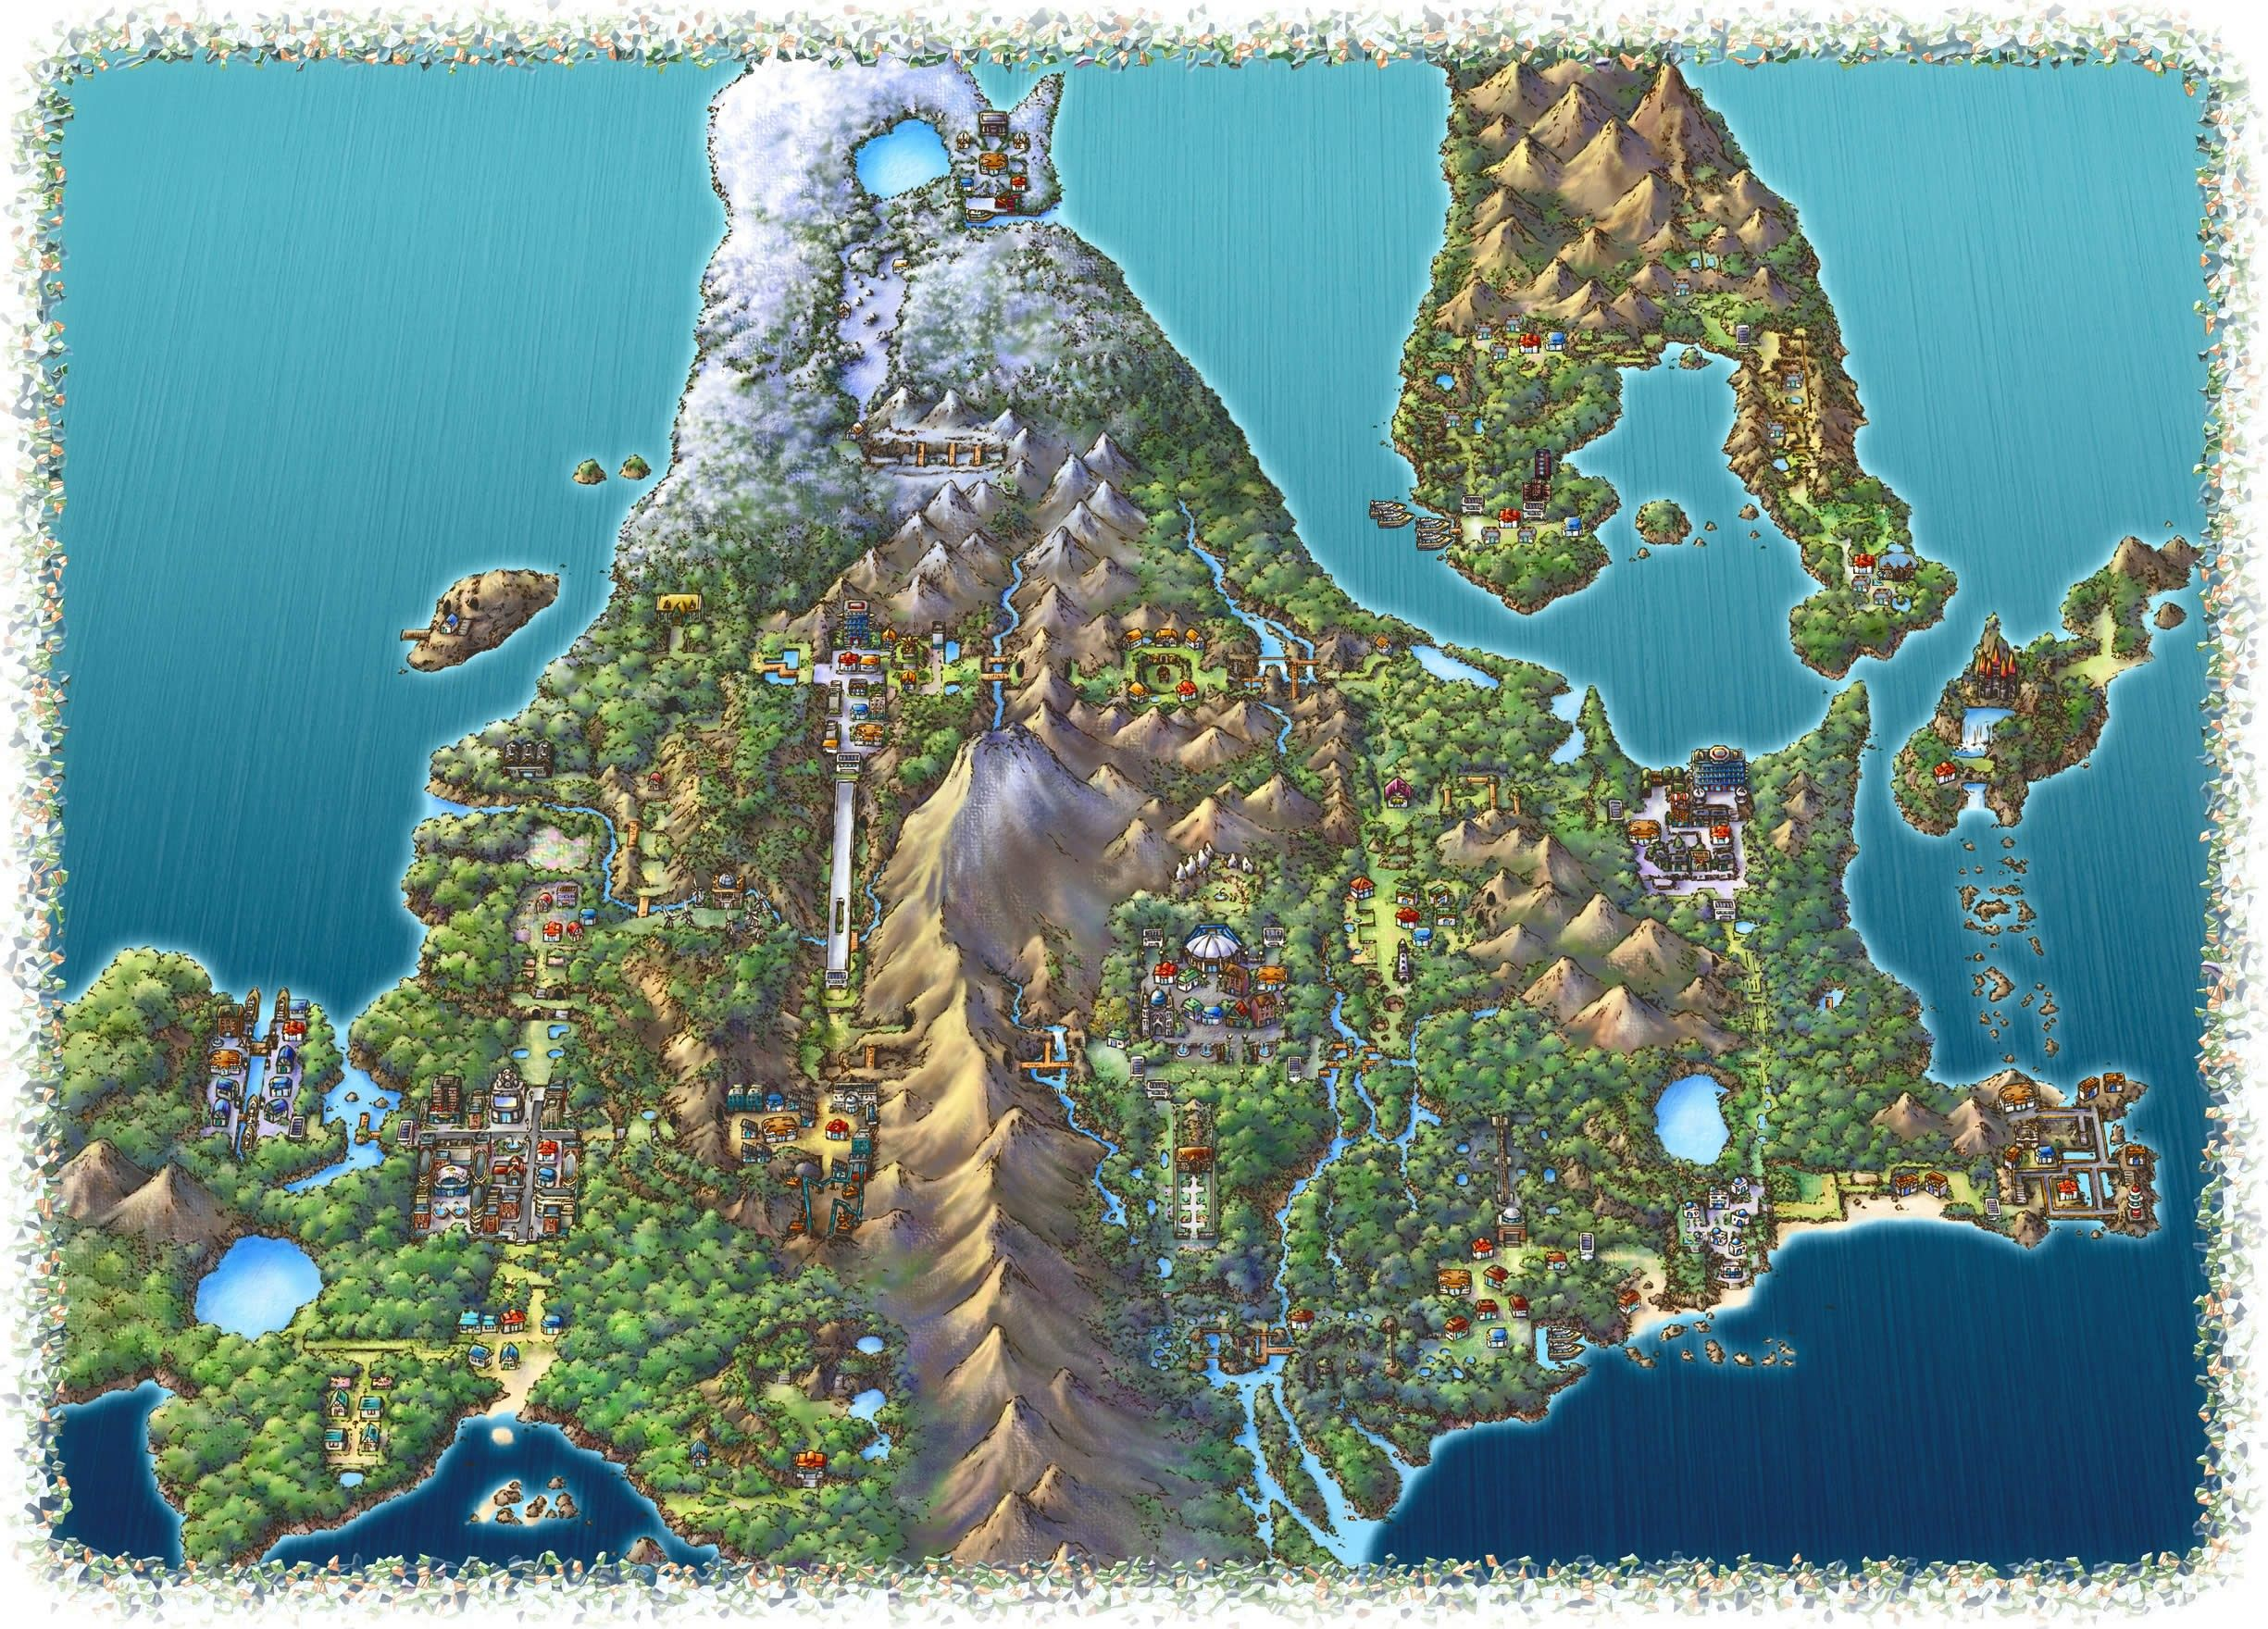 karakura town map, yangtze river delta map, naruto world map, kingdom hearts world map, seafoam islands map, trans-pecos map, orre map, iowa great lakes map, eastern mediterranean map, southern mindanao map, battle frontier map, upper nile map, moosehead lake map, at&t regional map, afghanistan-pakistan border map, indo-pacific map, sub-saharan map, sevii islands map, on sinnoh map